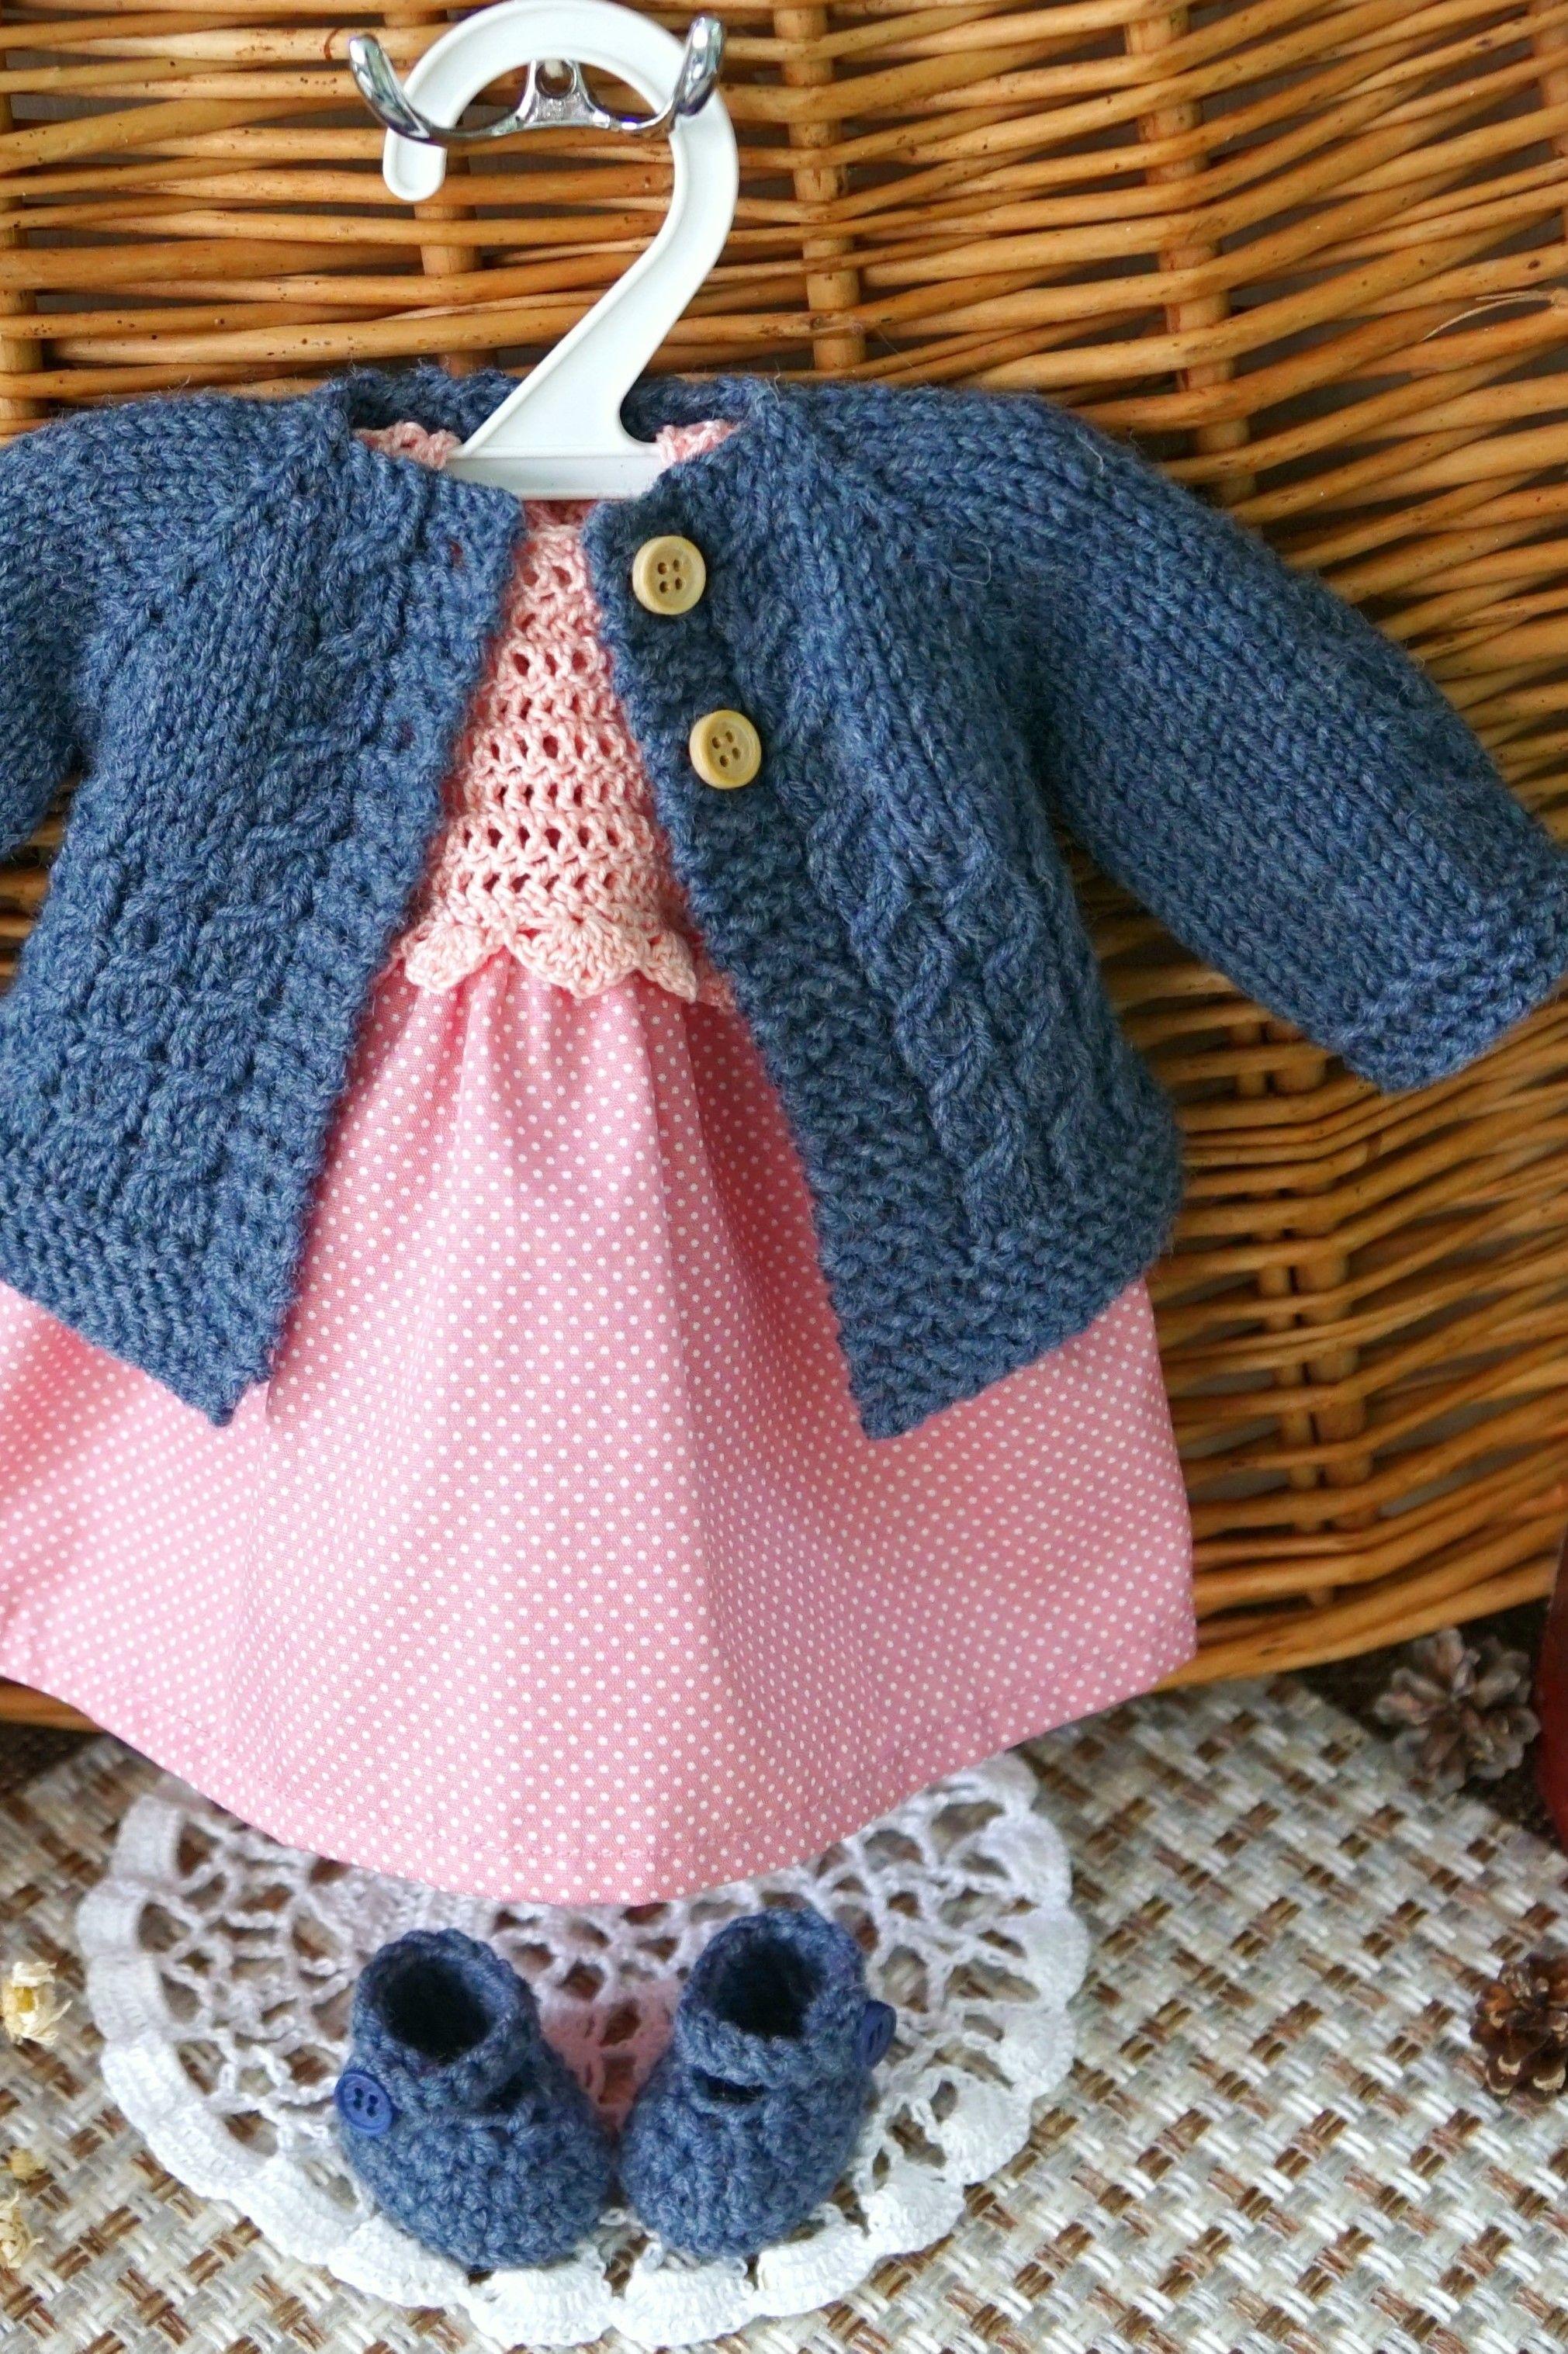 Doll clothes set, pink salmon cotton dress, denim blue knit jacket, blue Slippers. Handmade #dollclothes